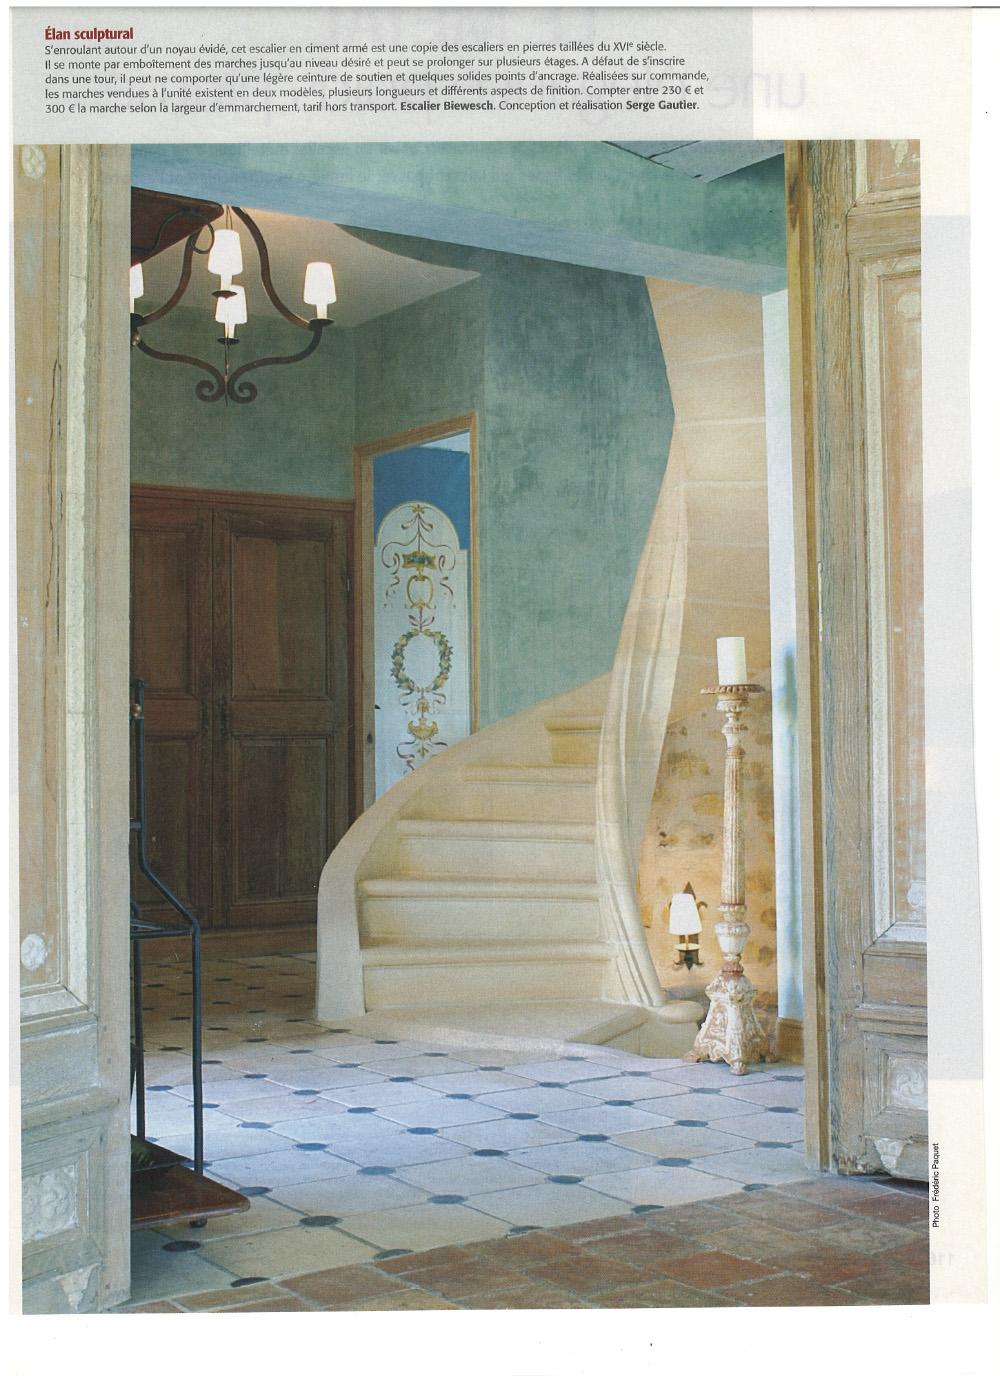 escalier serge gautier serge gautier. Black Bedroom Furniture Sets. Home Design Ideas